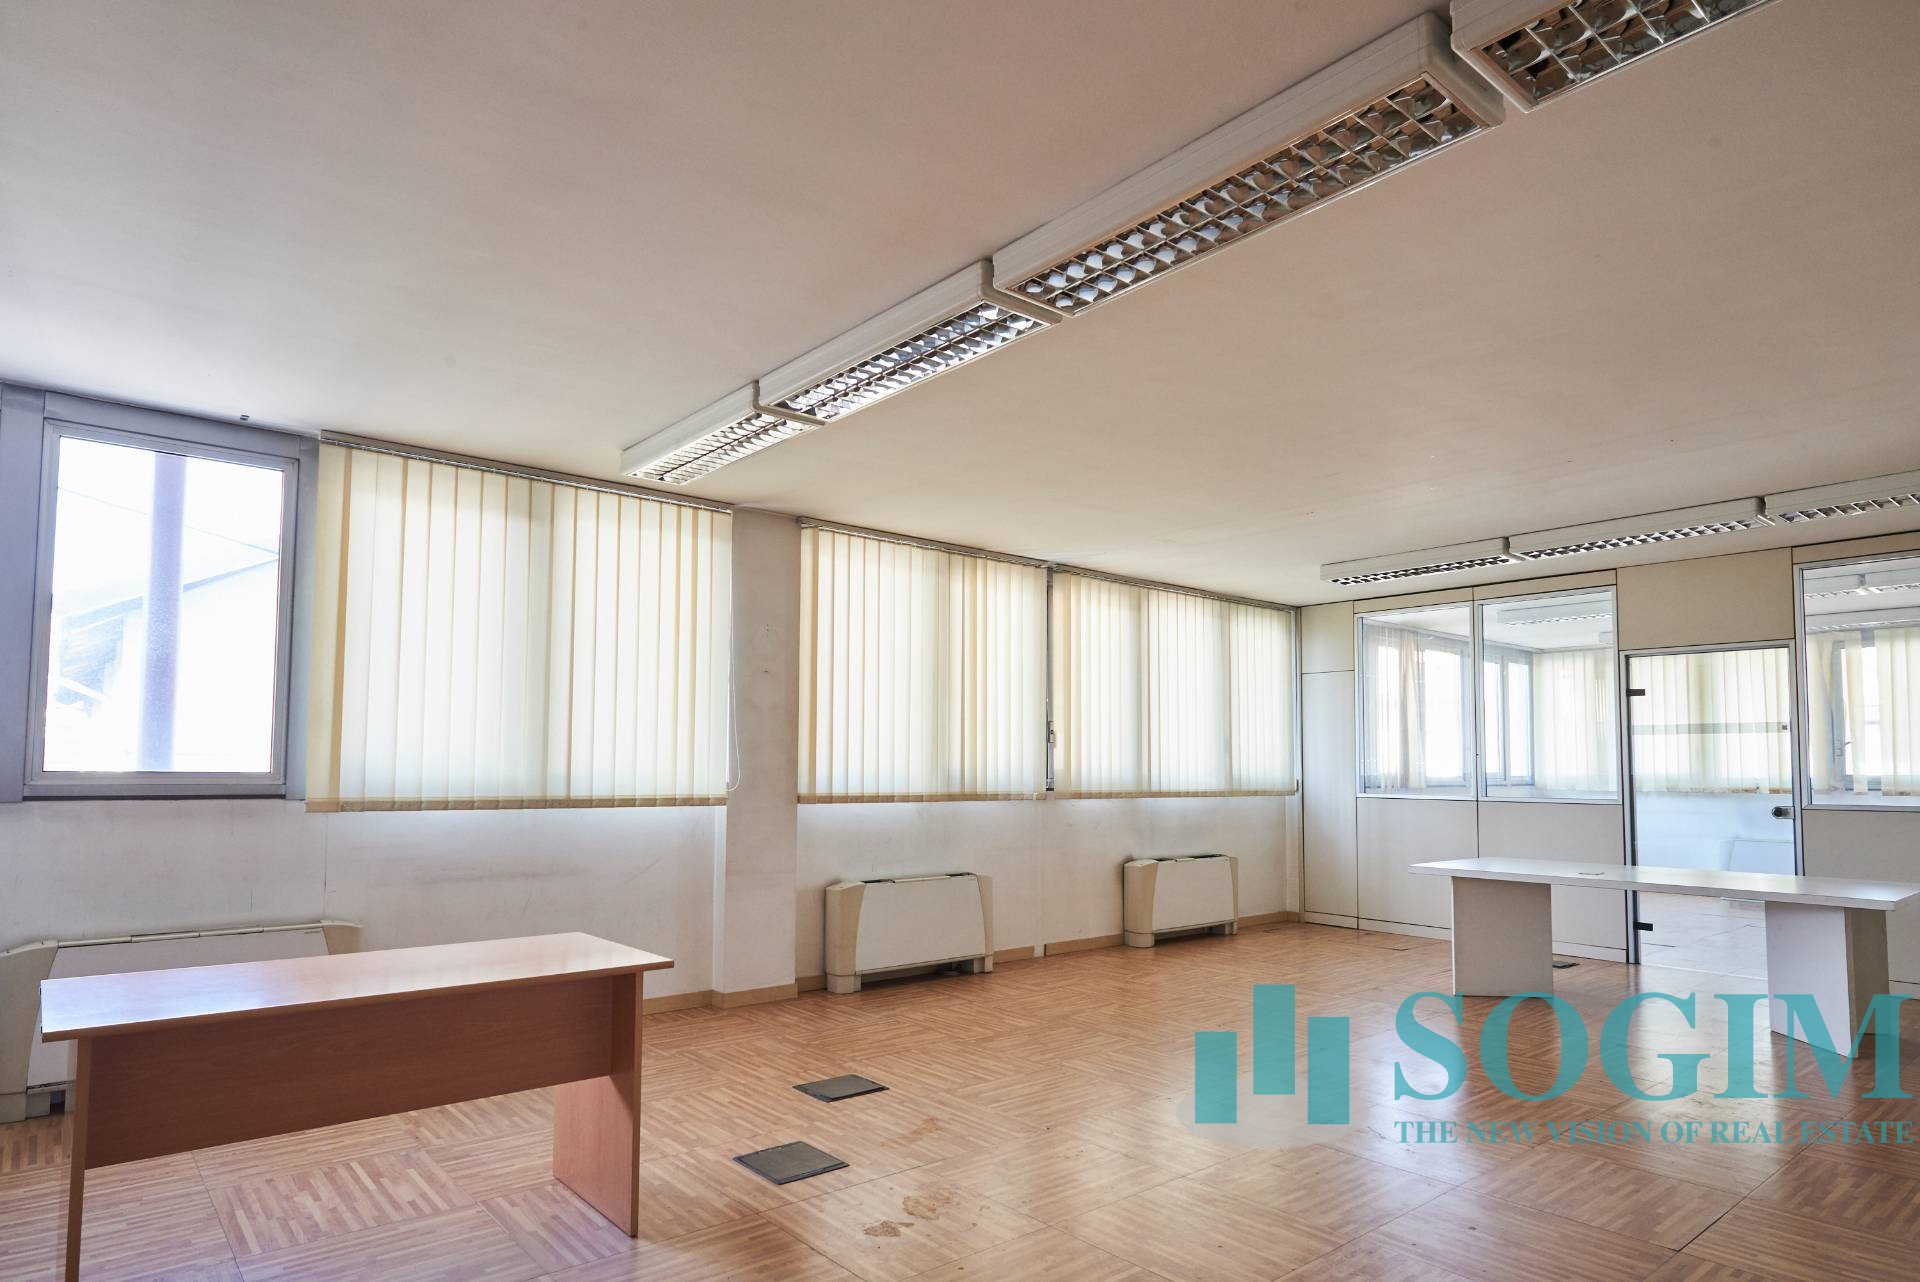 Ufficio in Vendita a Novate Milanese  rif. 9396